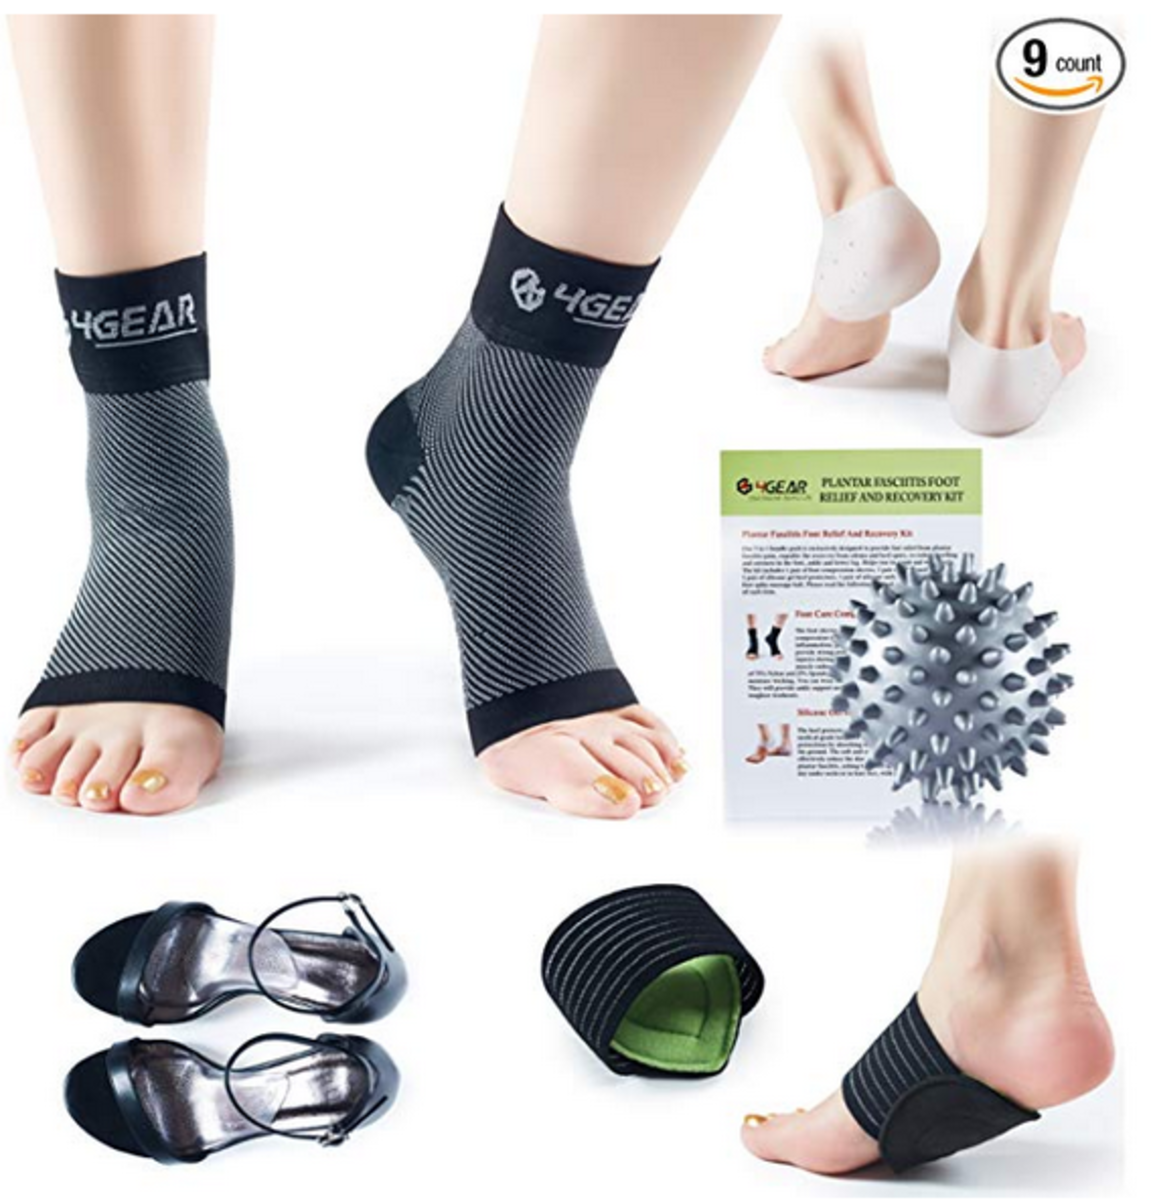 top-5-solutions-for-plantar-fasciitis-heel-pain